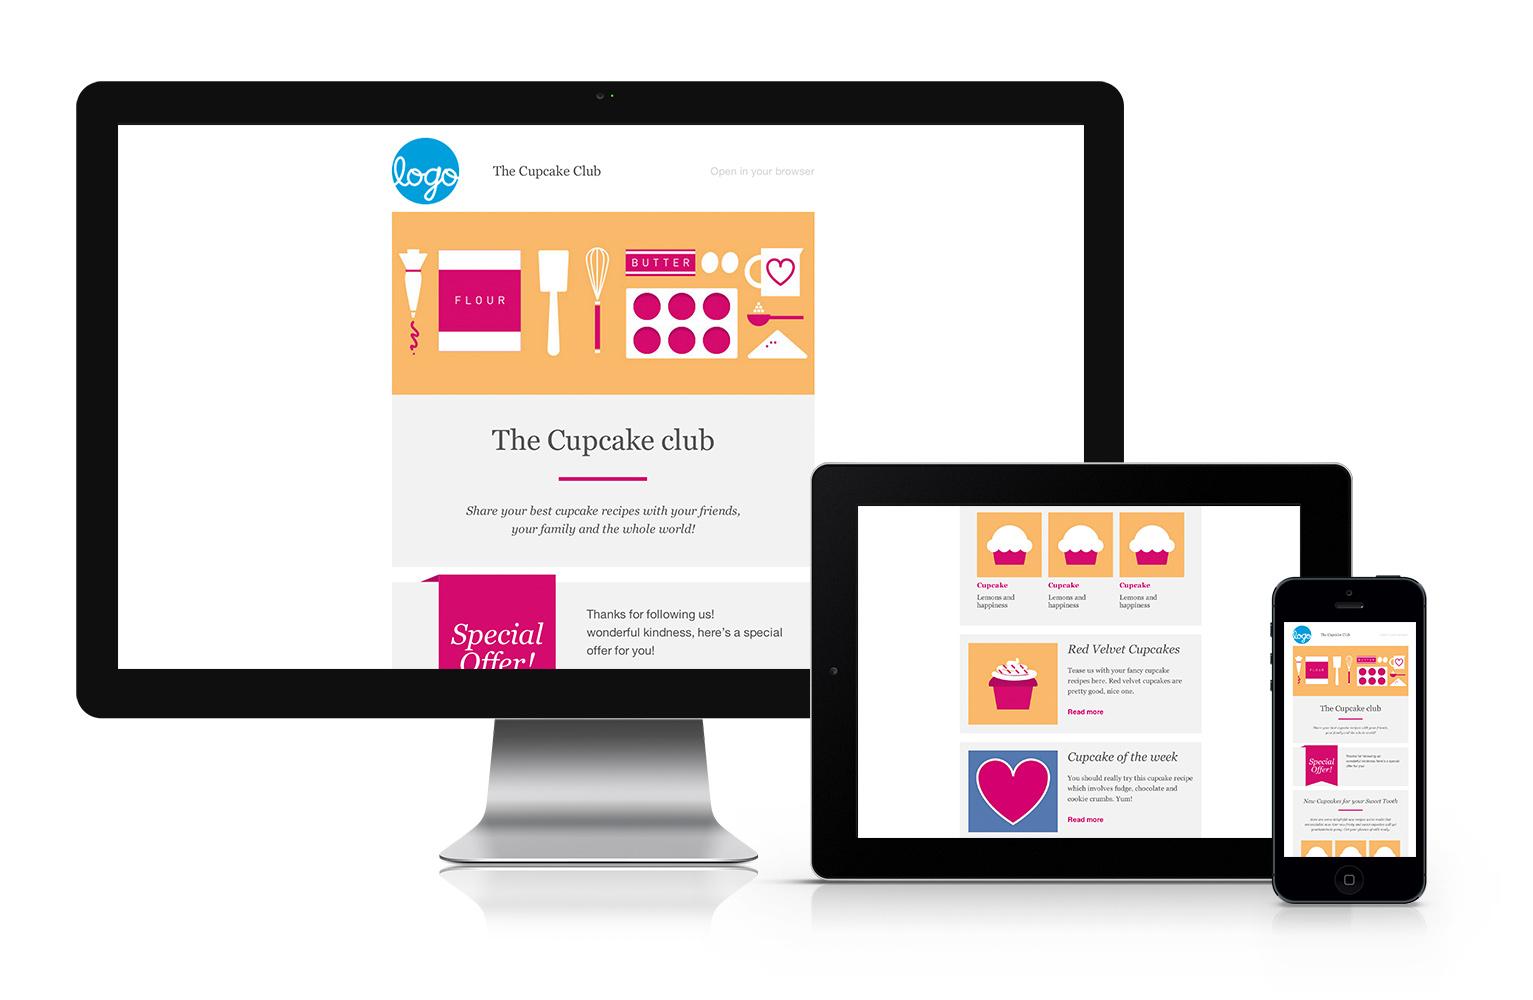 Template per Newsletter da Scaricare Gratis - Cupcake